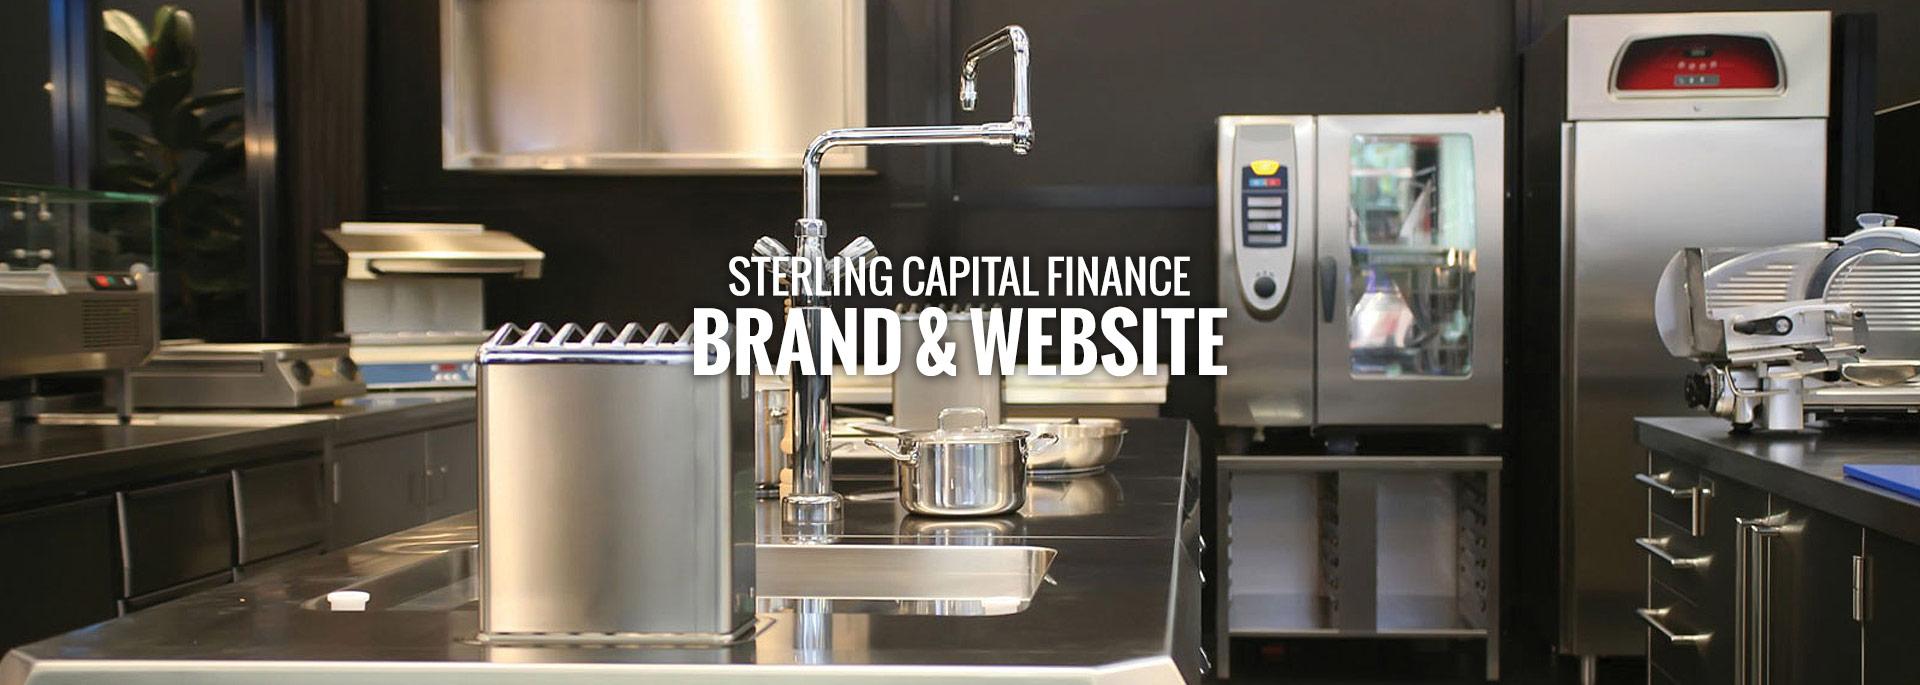 Supercar Finance brand and website design